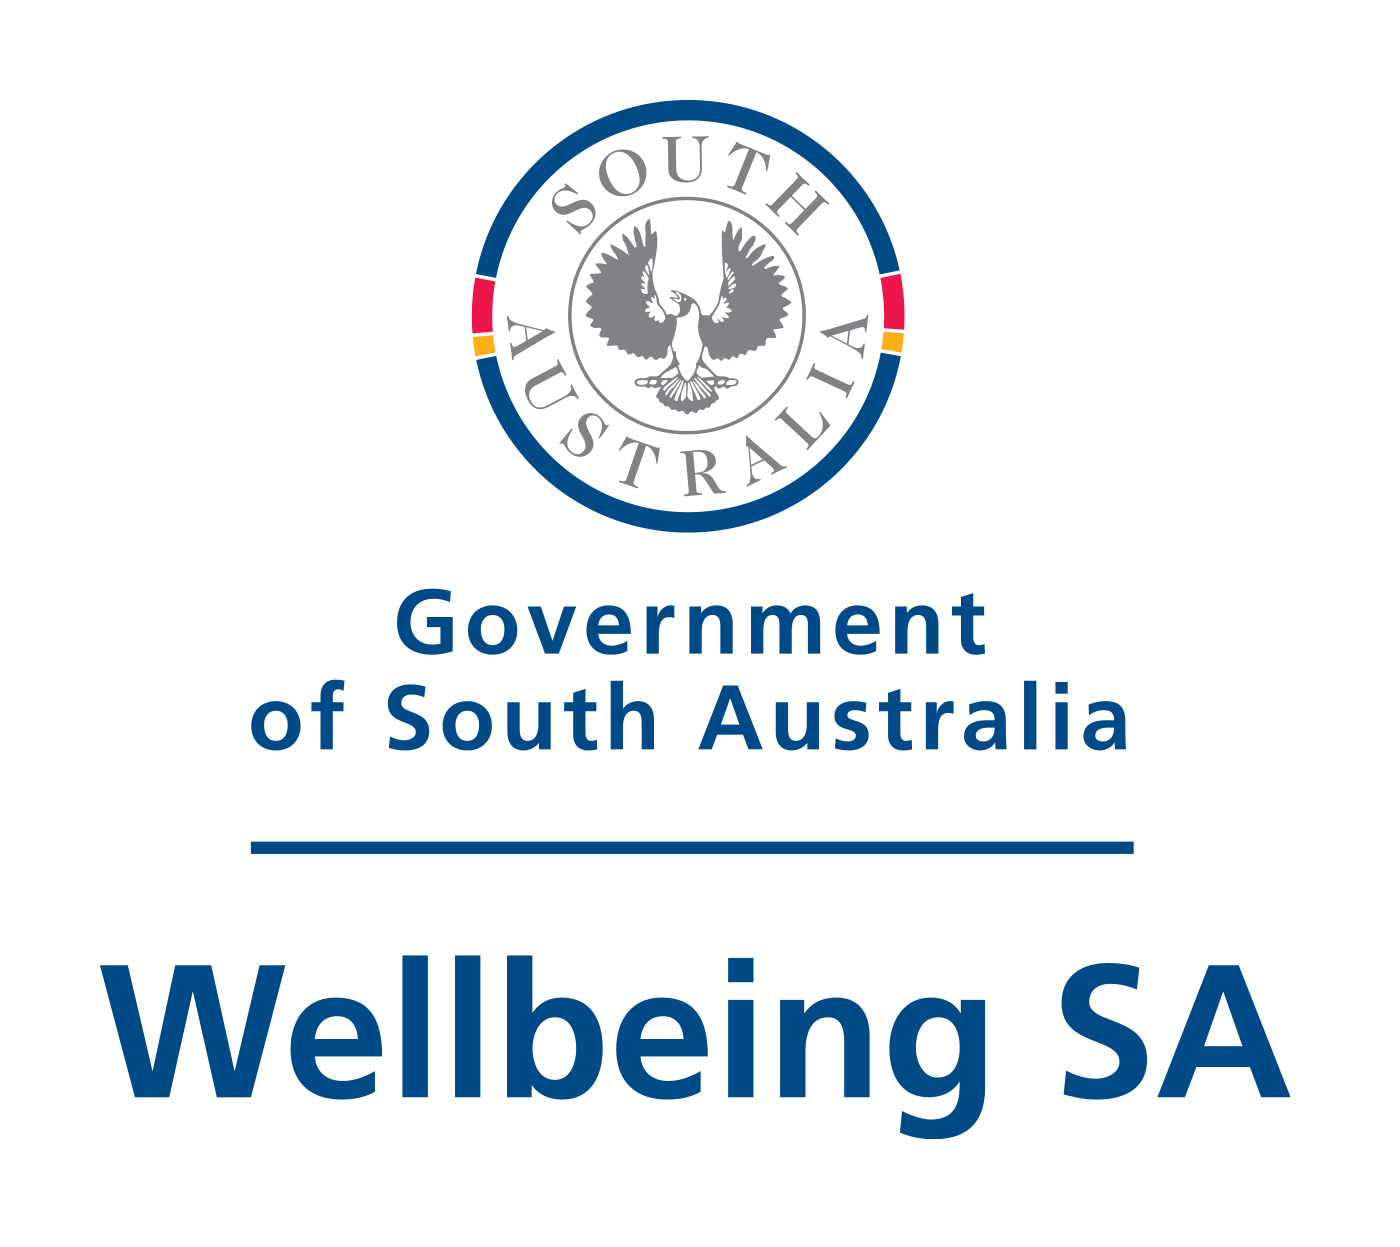 Wellbeing SA logo